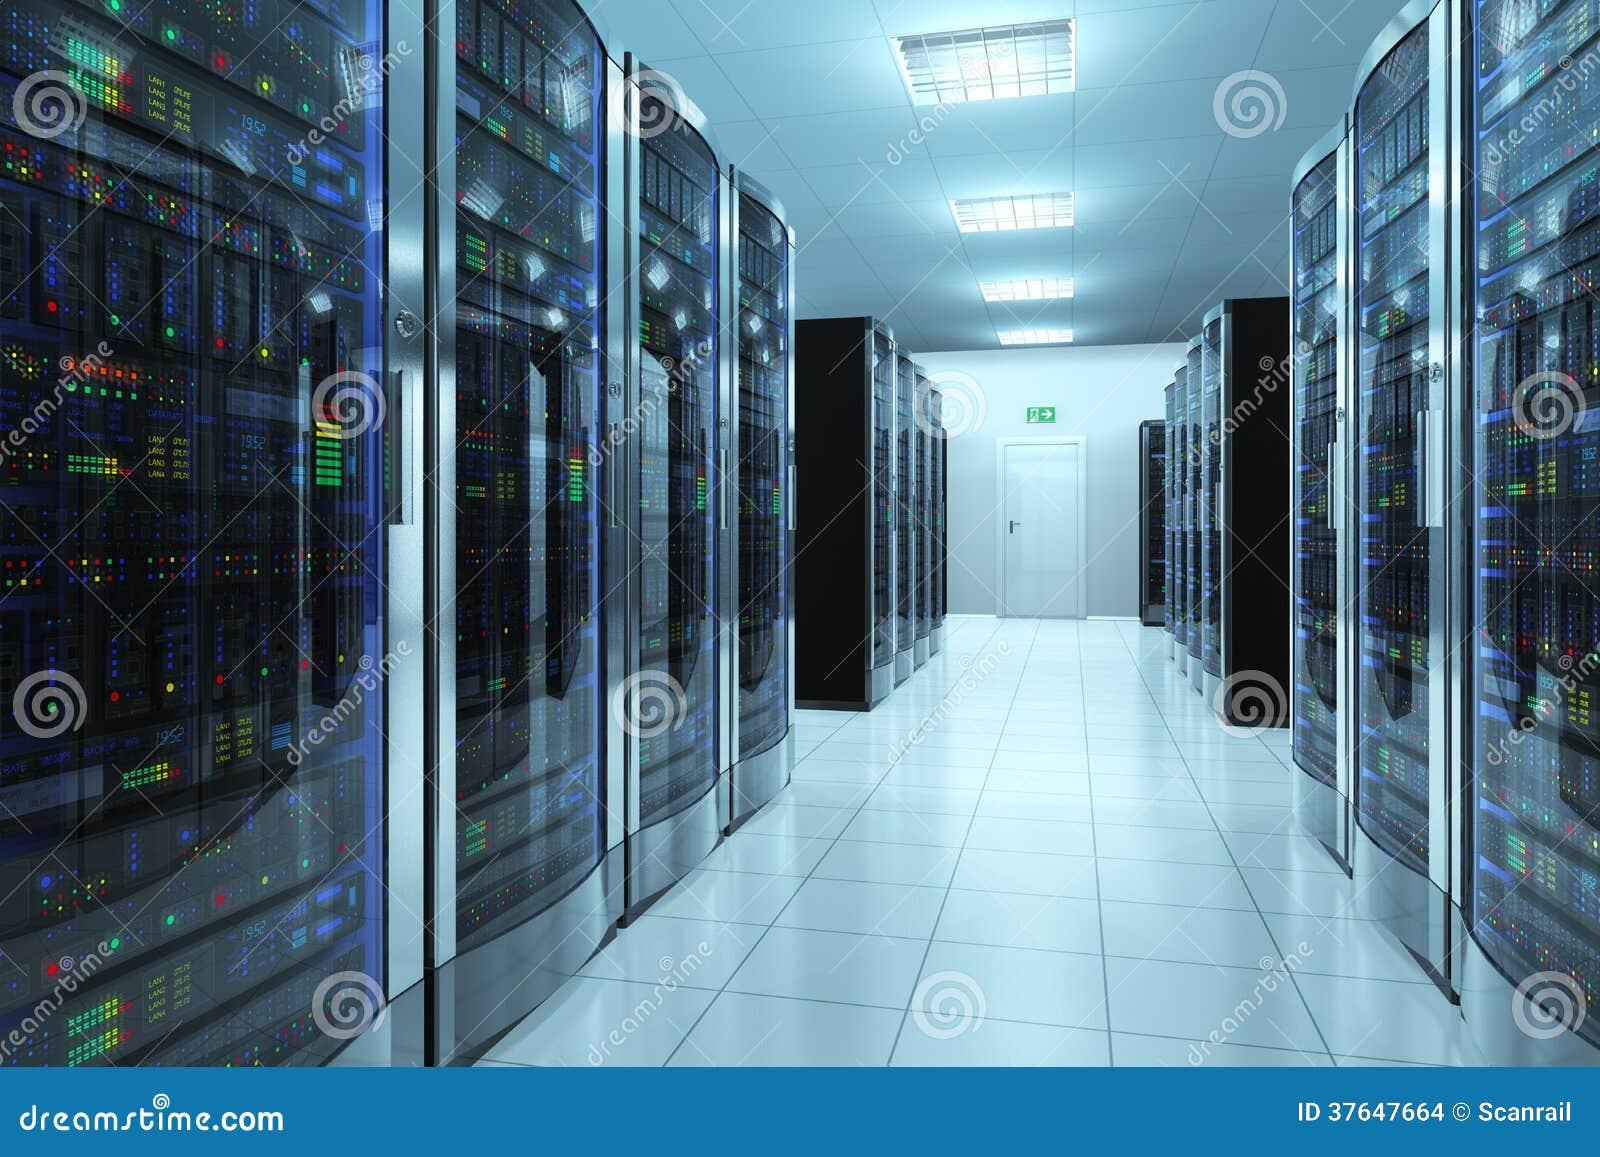 Serverruimte in datacenter